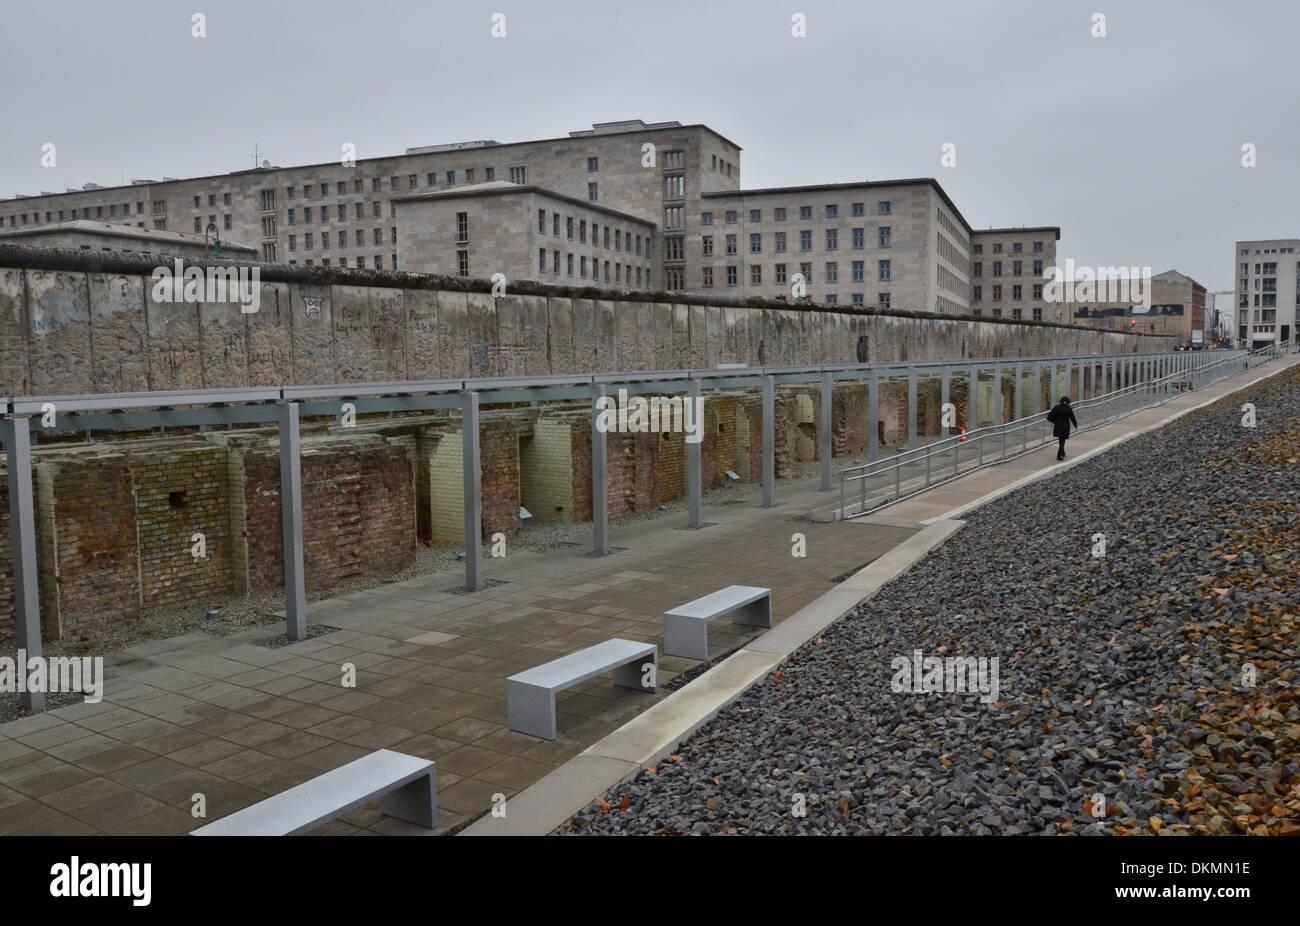 Topography of Terror Documentation Center, Berlin, Germany - Stock Image